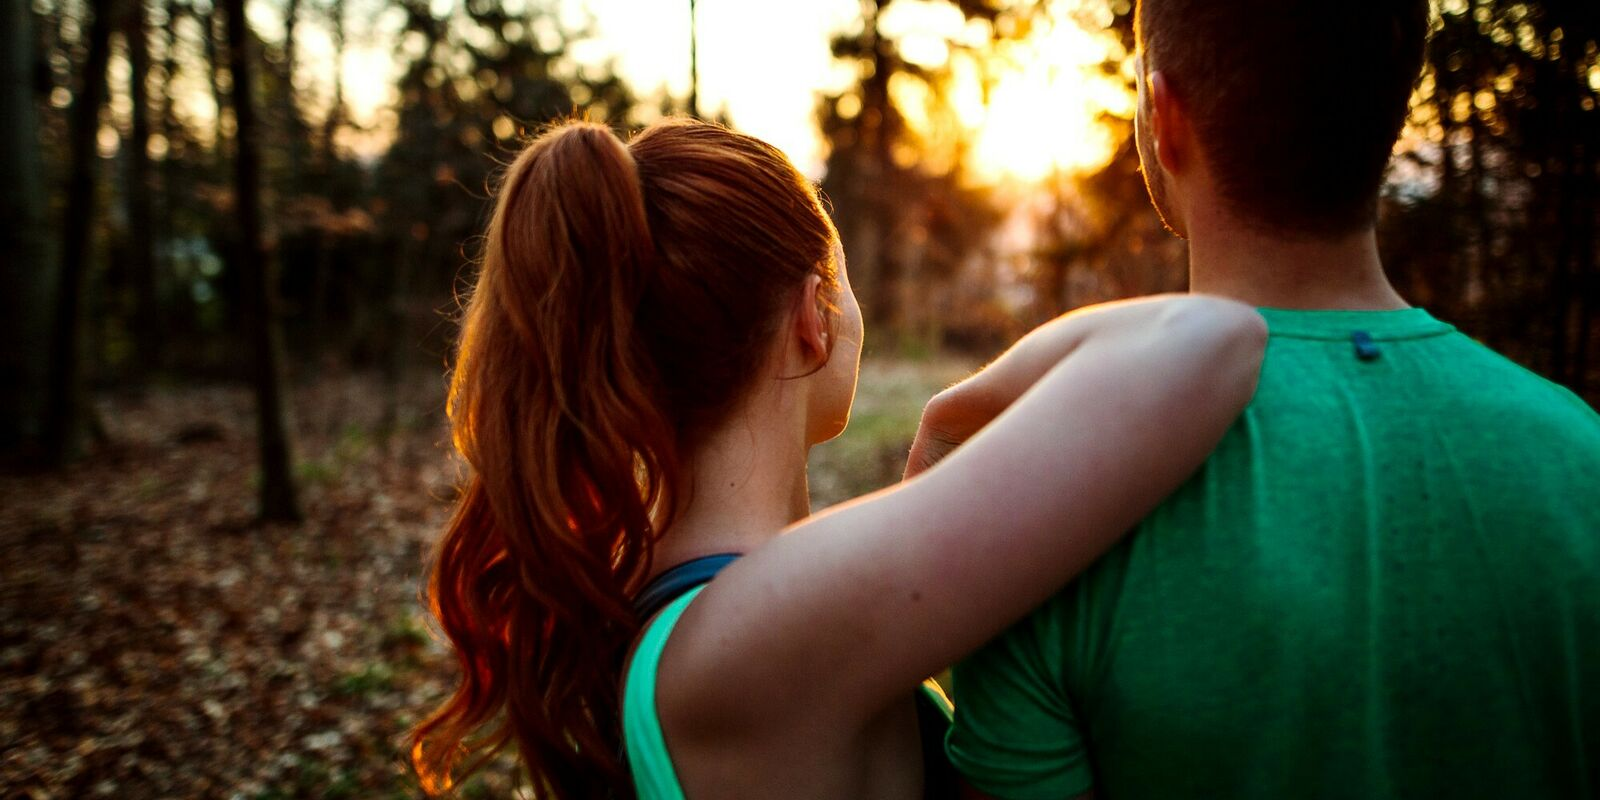 Stefan und Julia beobachten den Sonnenaufgang.